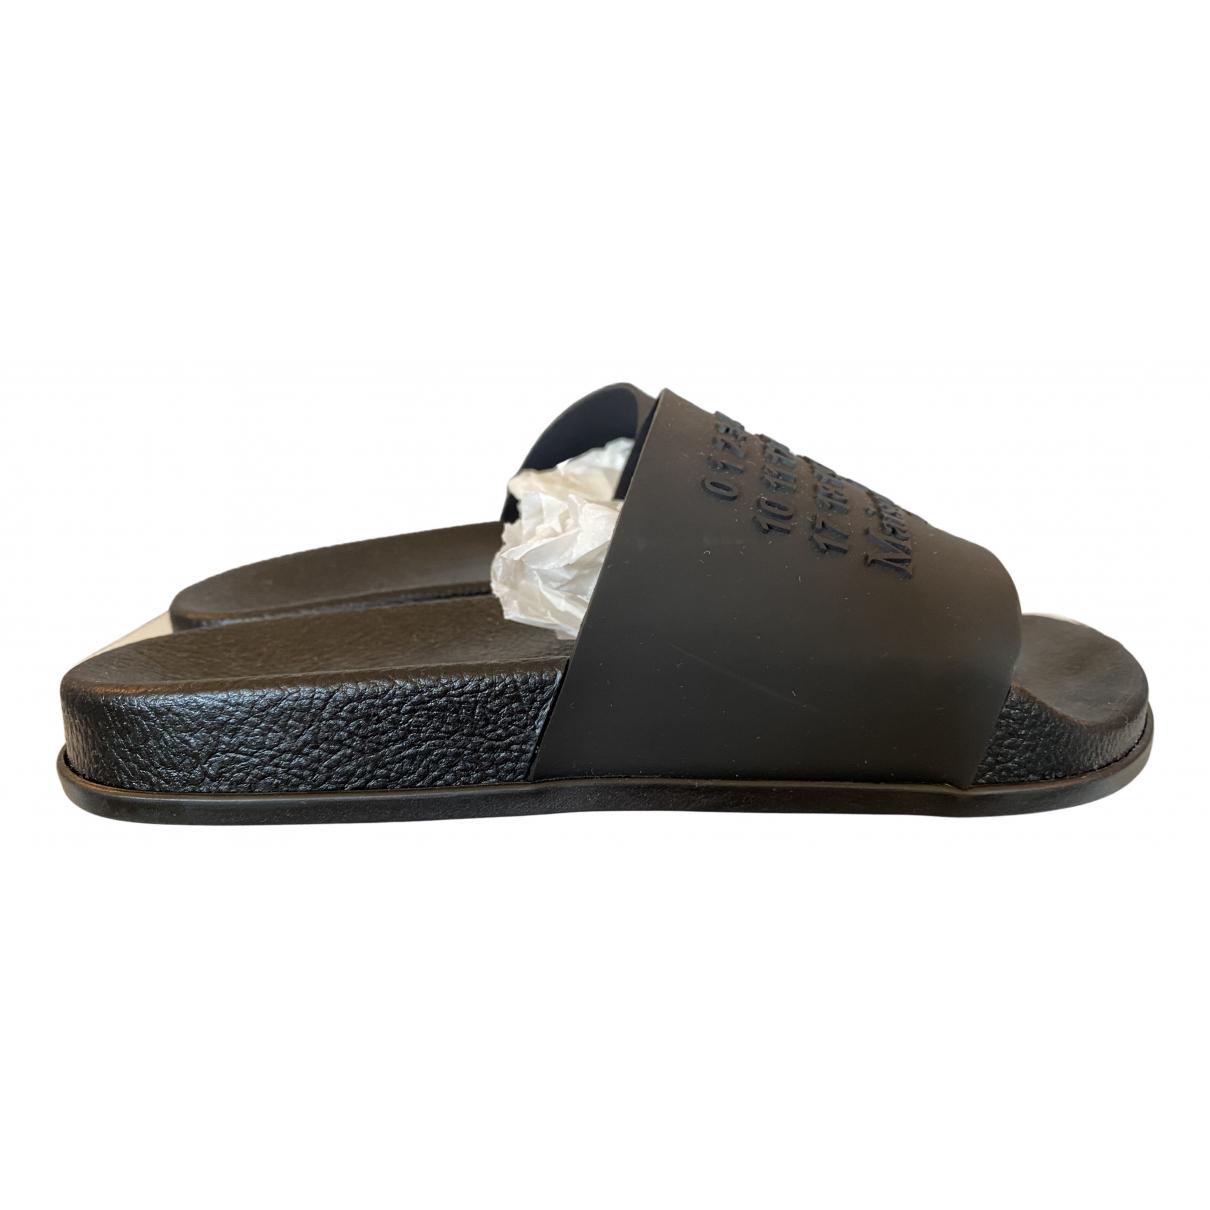 Maison Martin Margiela \N Black Rubber Sandals for Men 40 EU